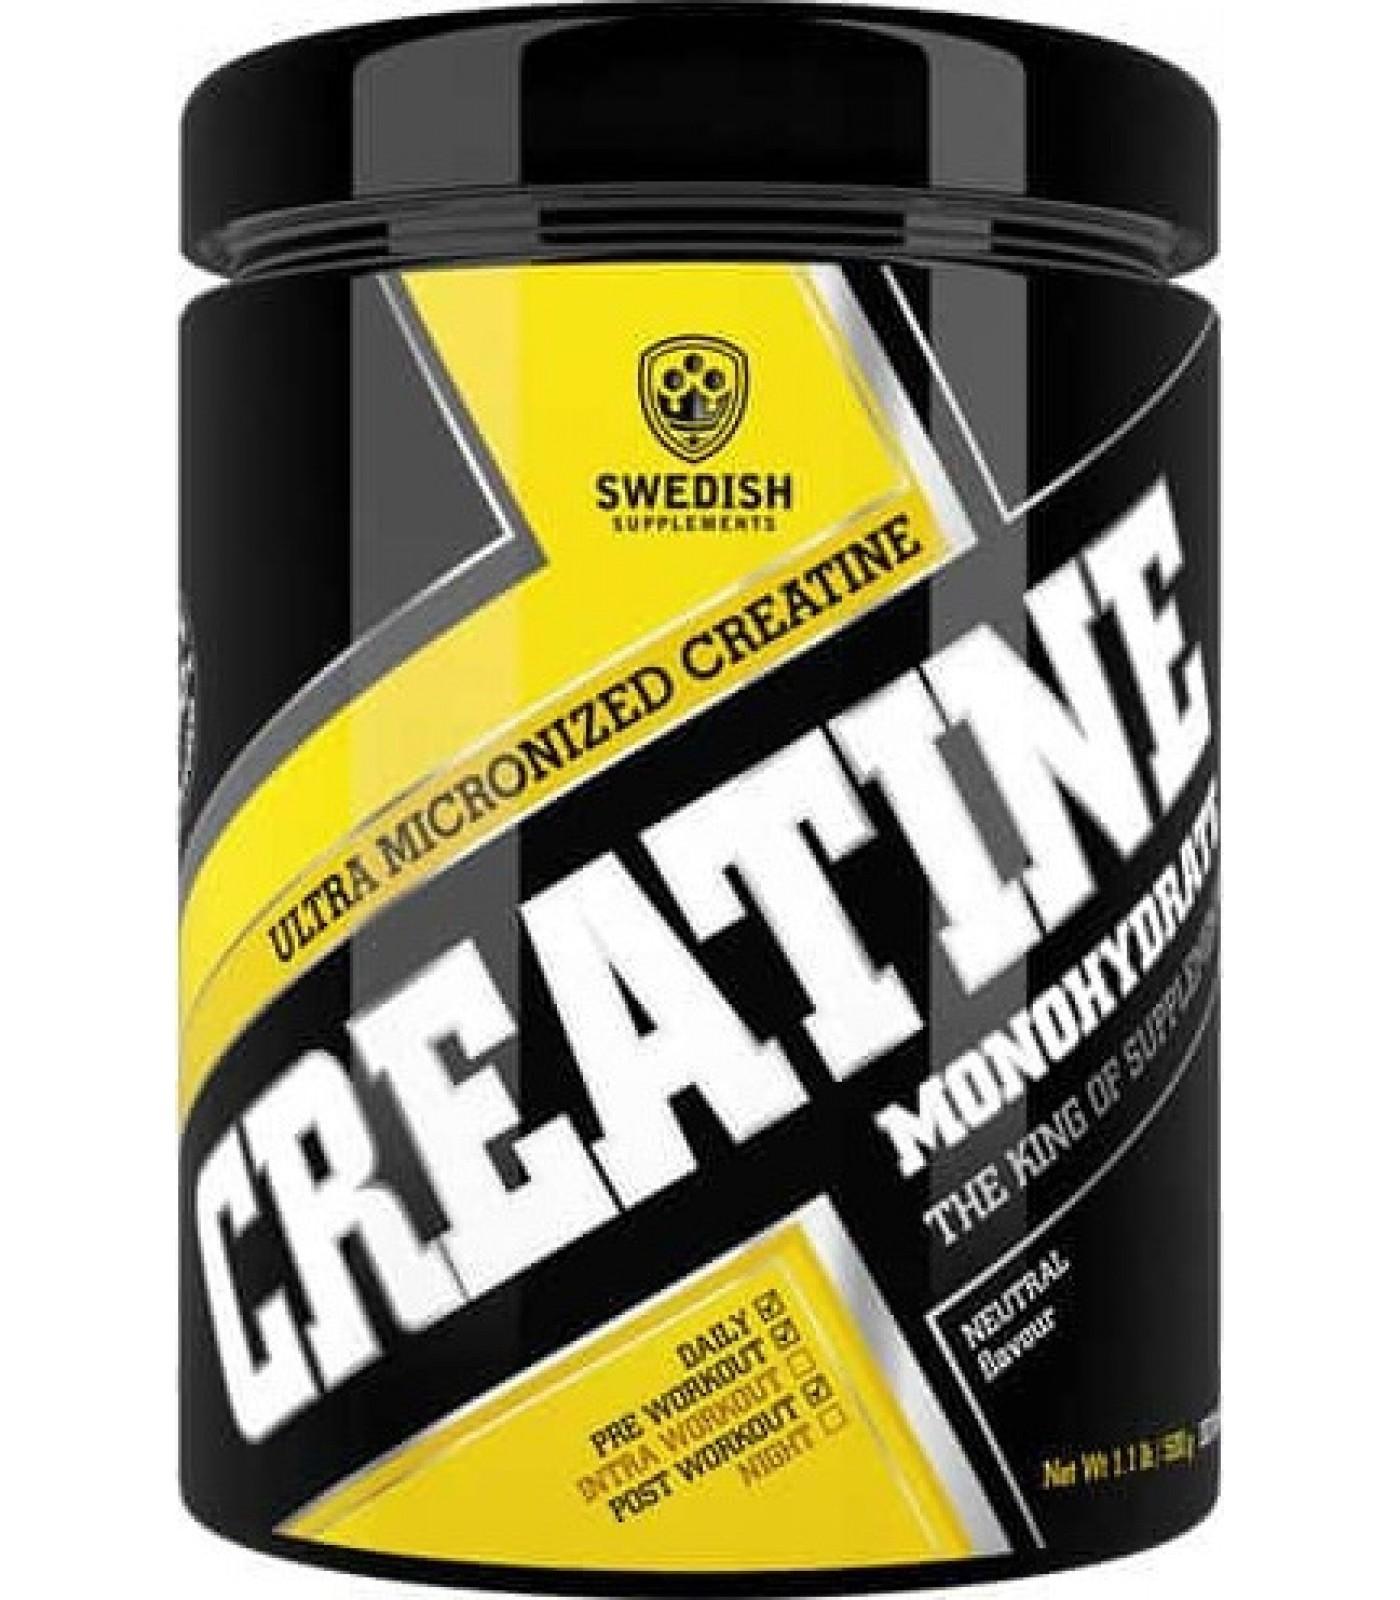 SWEDISH Supplements - Creatine Monohydrate / Extra Micronized